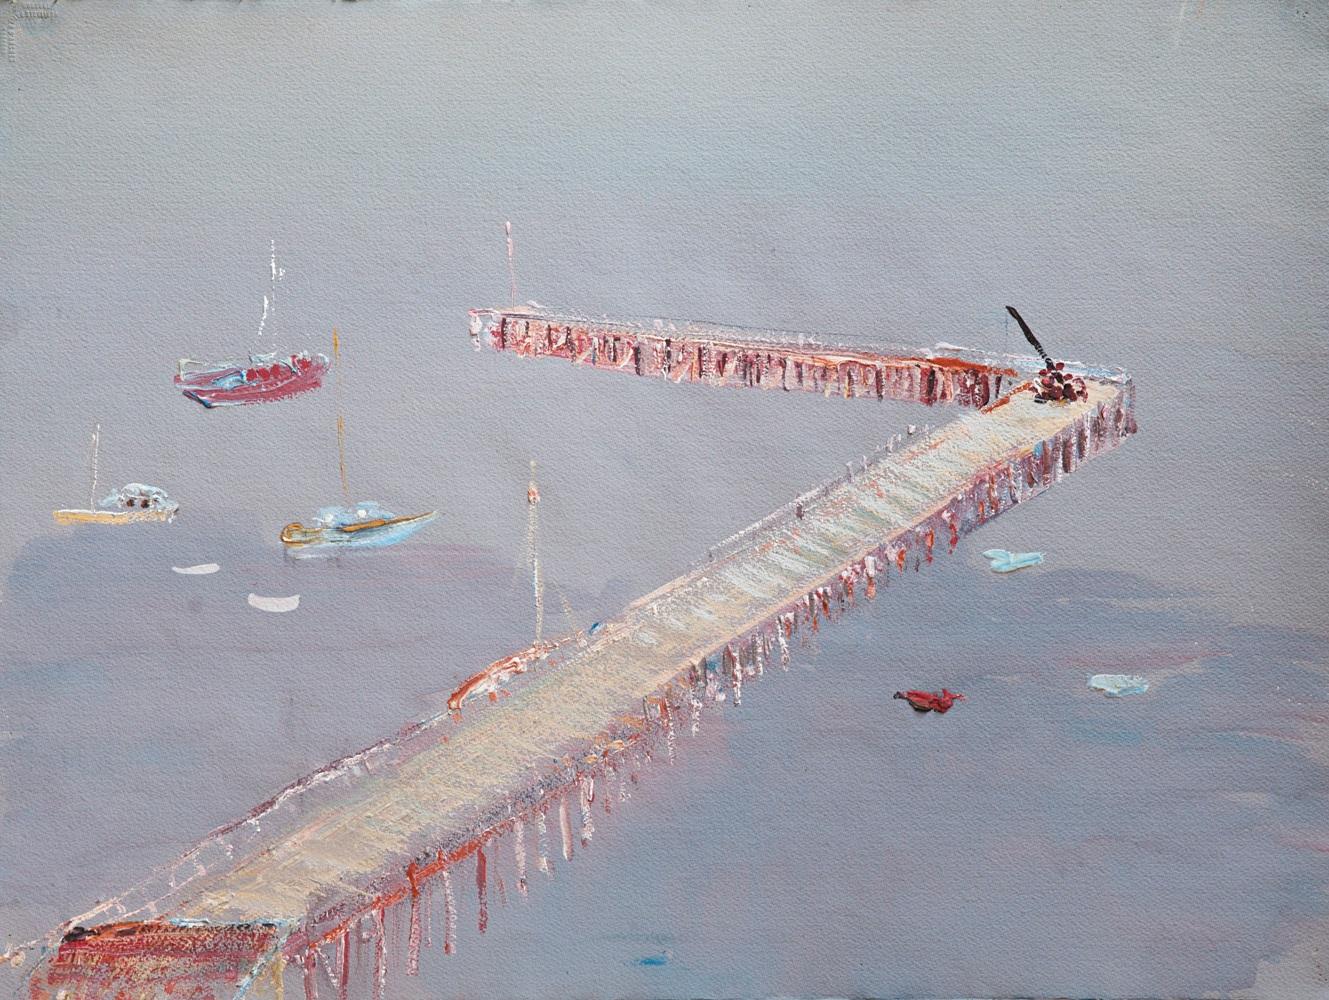 Hal Hattam, Pier-Flinders, gouache on paper, 56x75cm $4400 SOLD